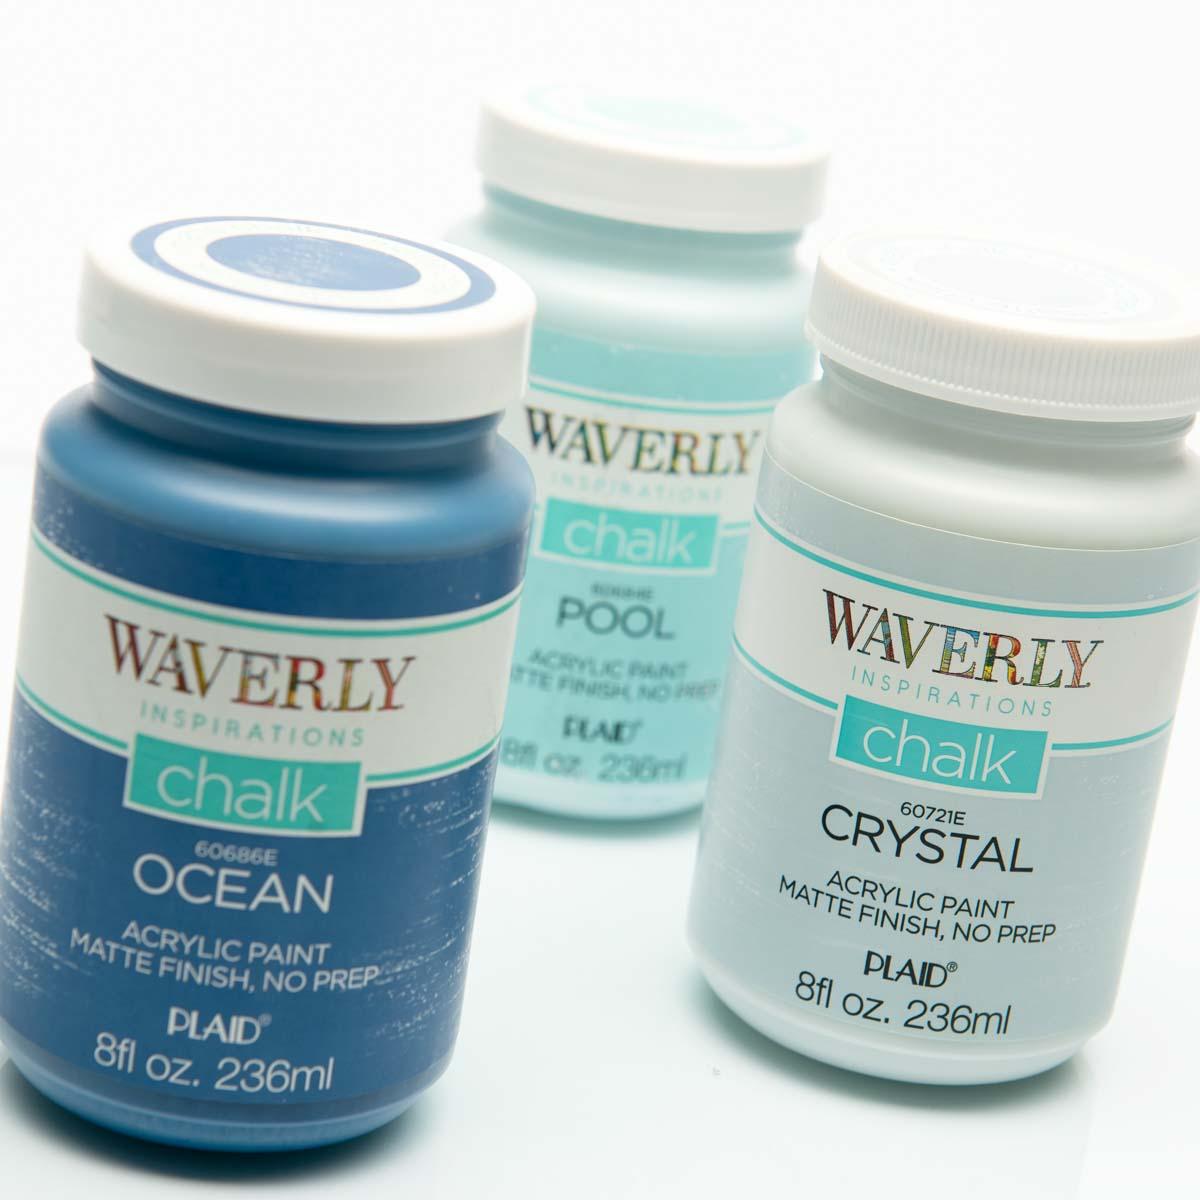 Waverly ® Inspirations Chalk Finish Acrylic Paint Set - Blues, 3 pc. - 13404